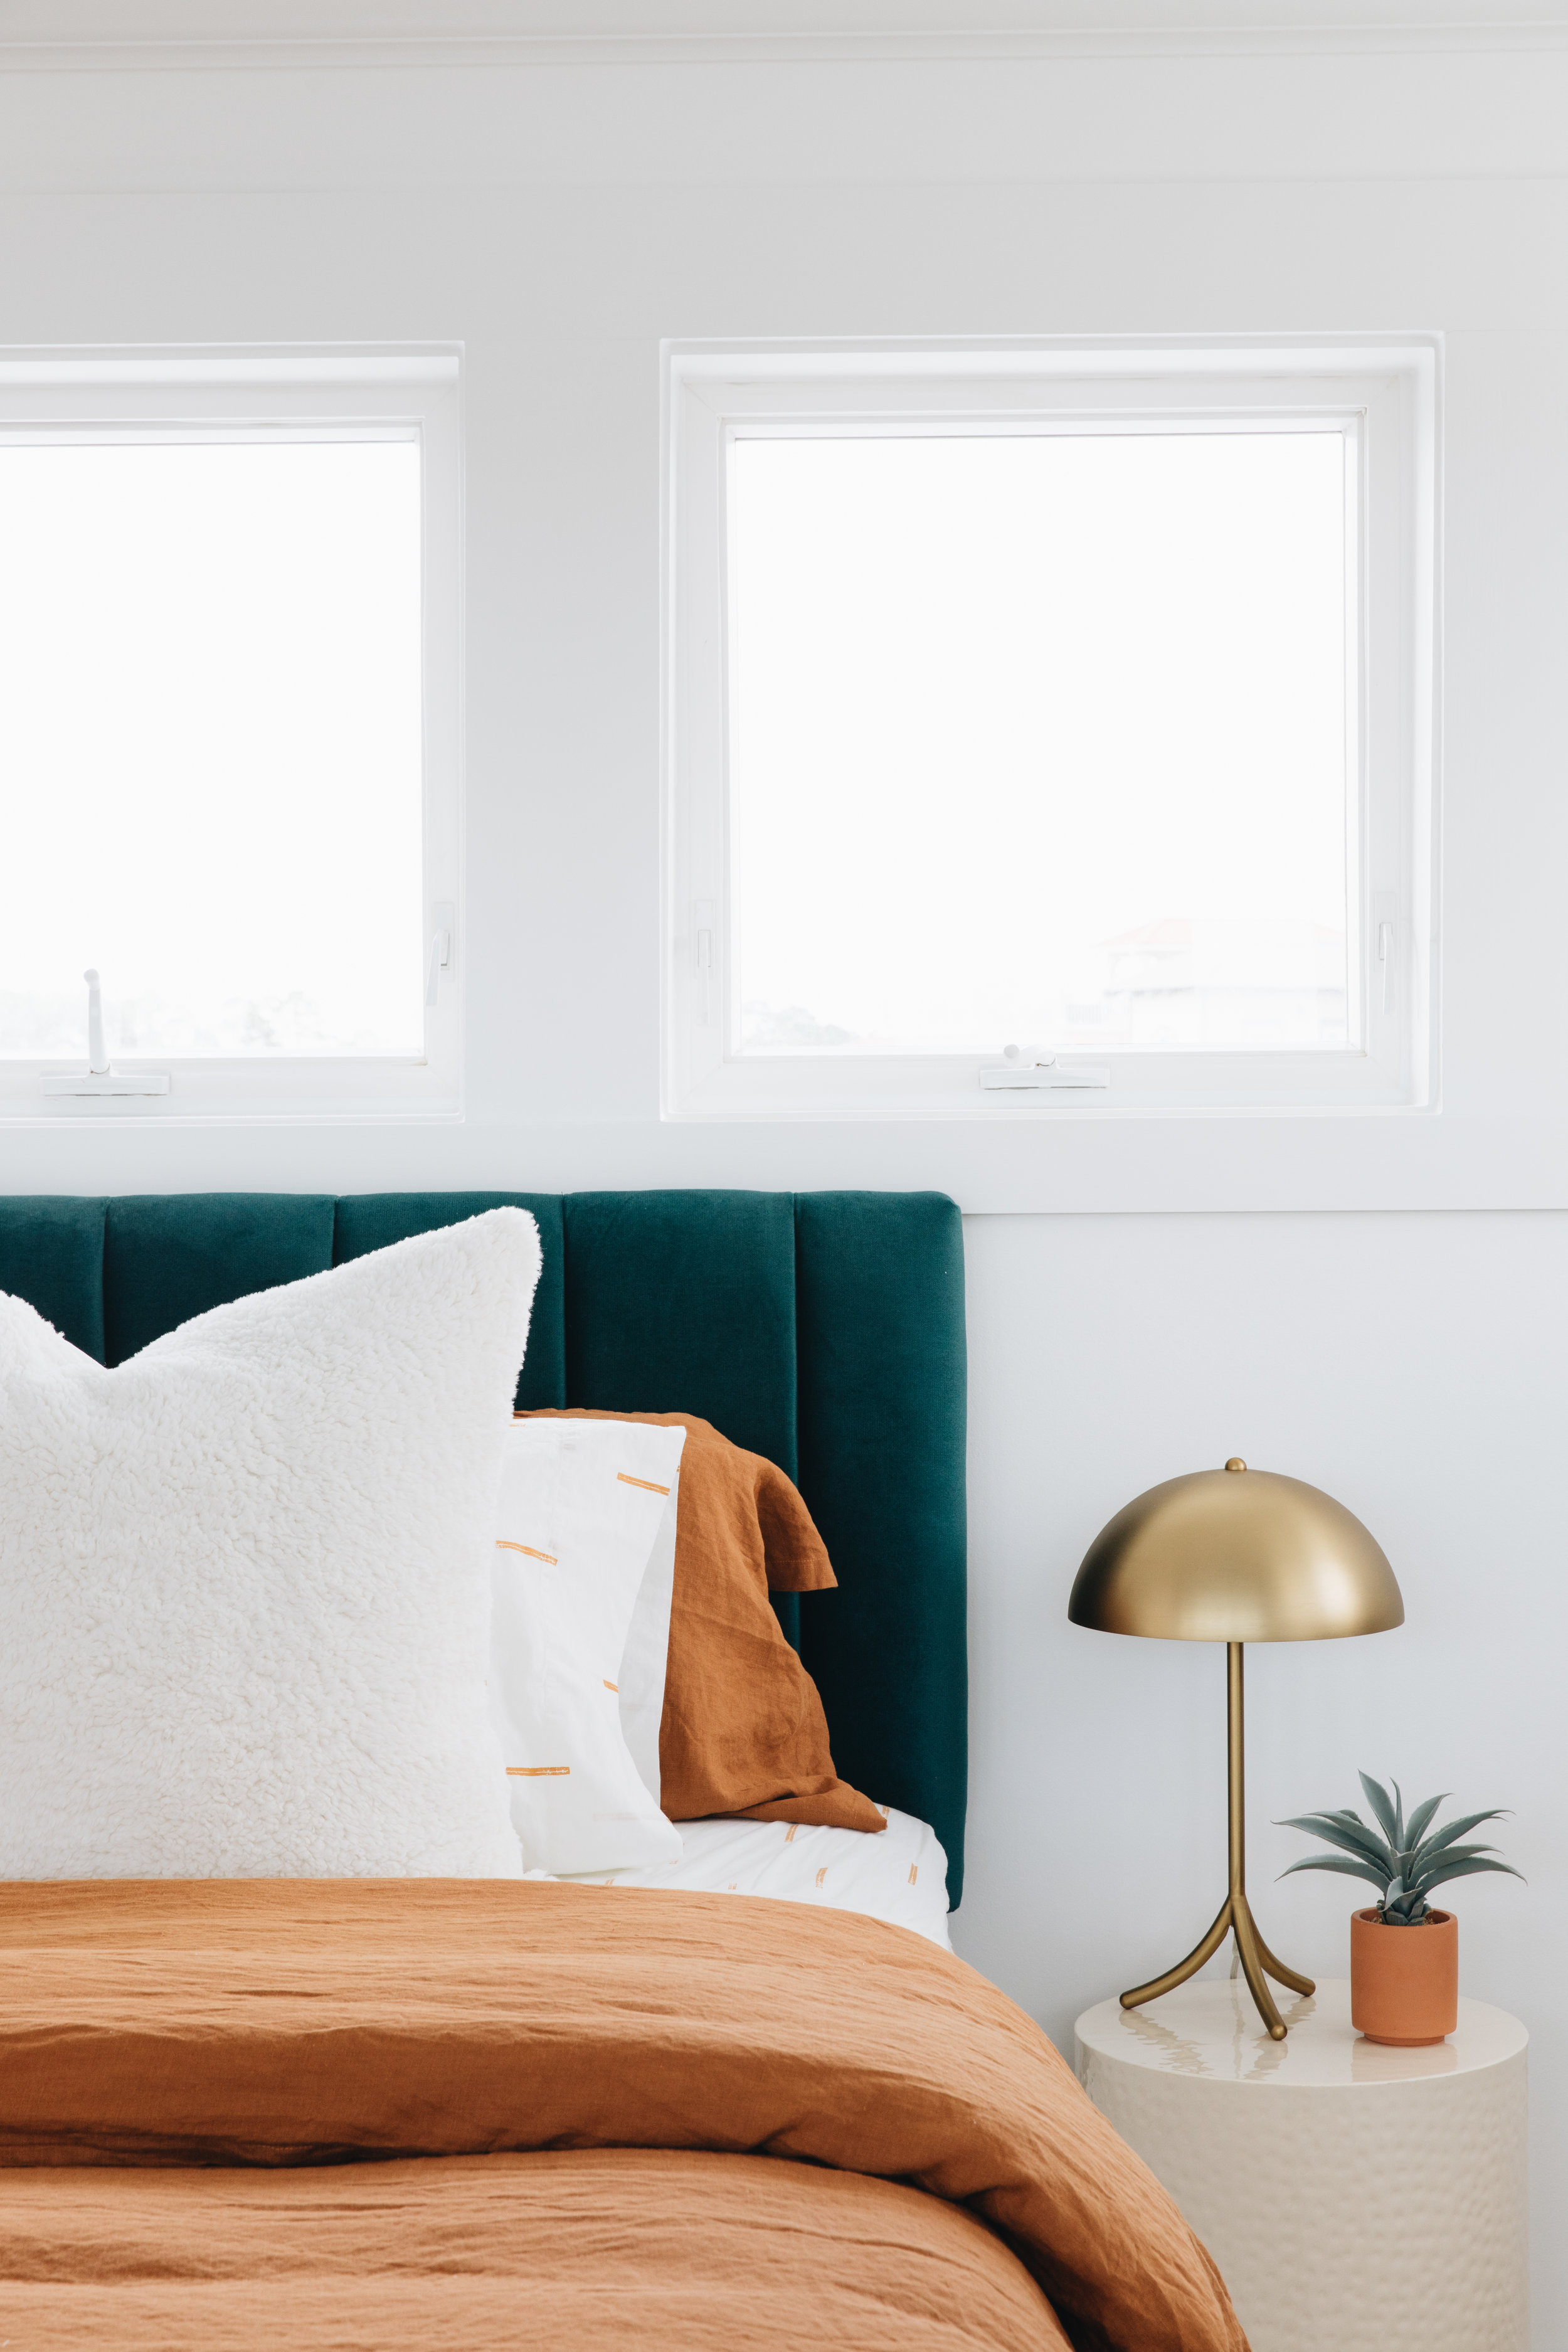 Duvet    Side Table (similar)    Bedside Lamp (similar)